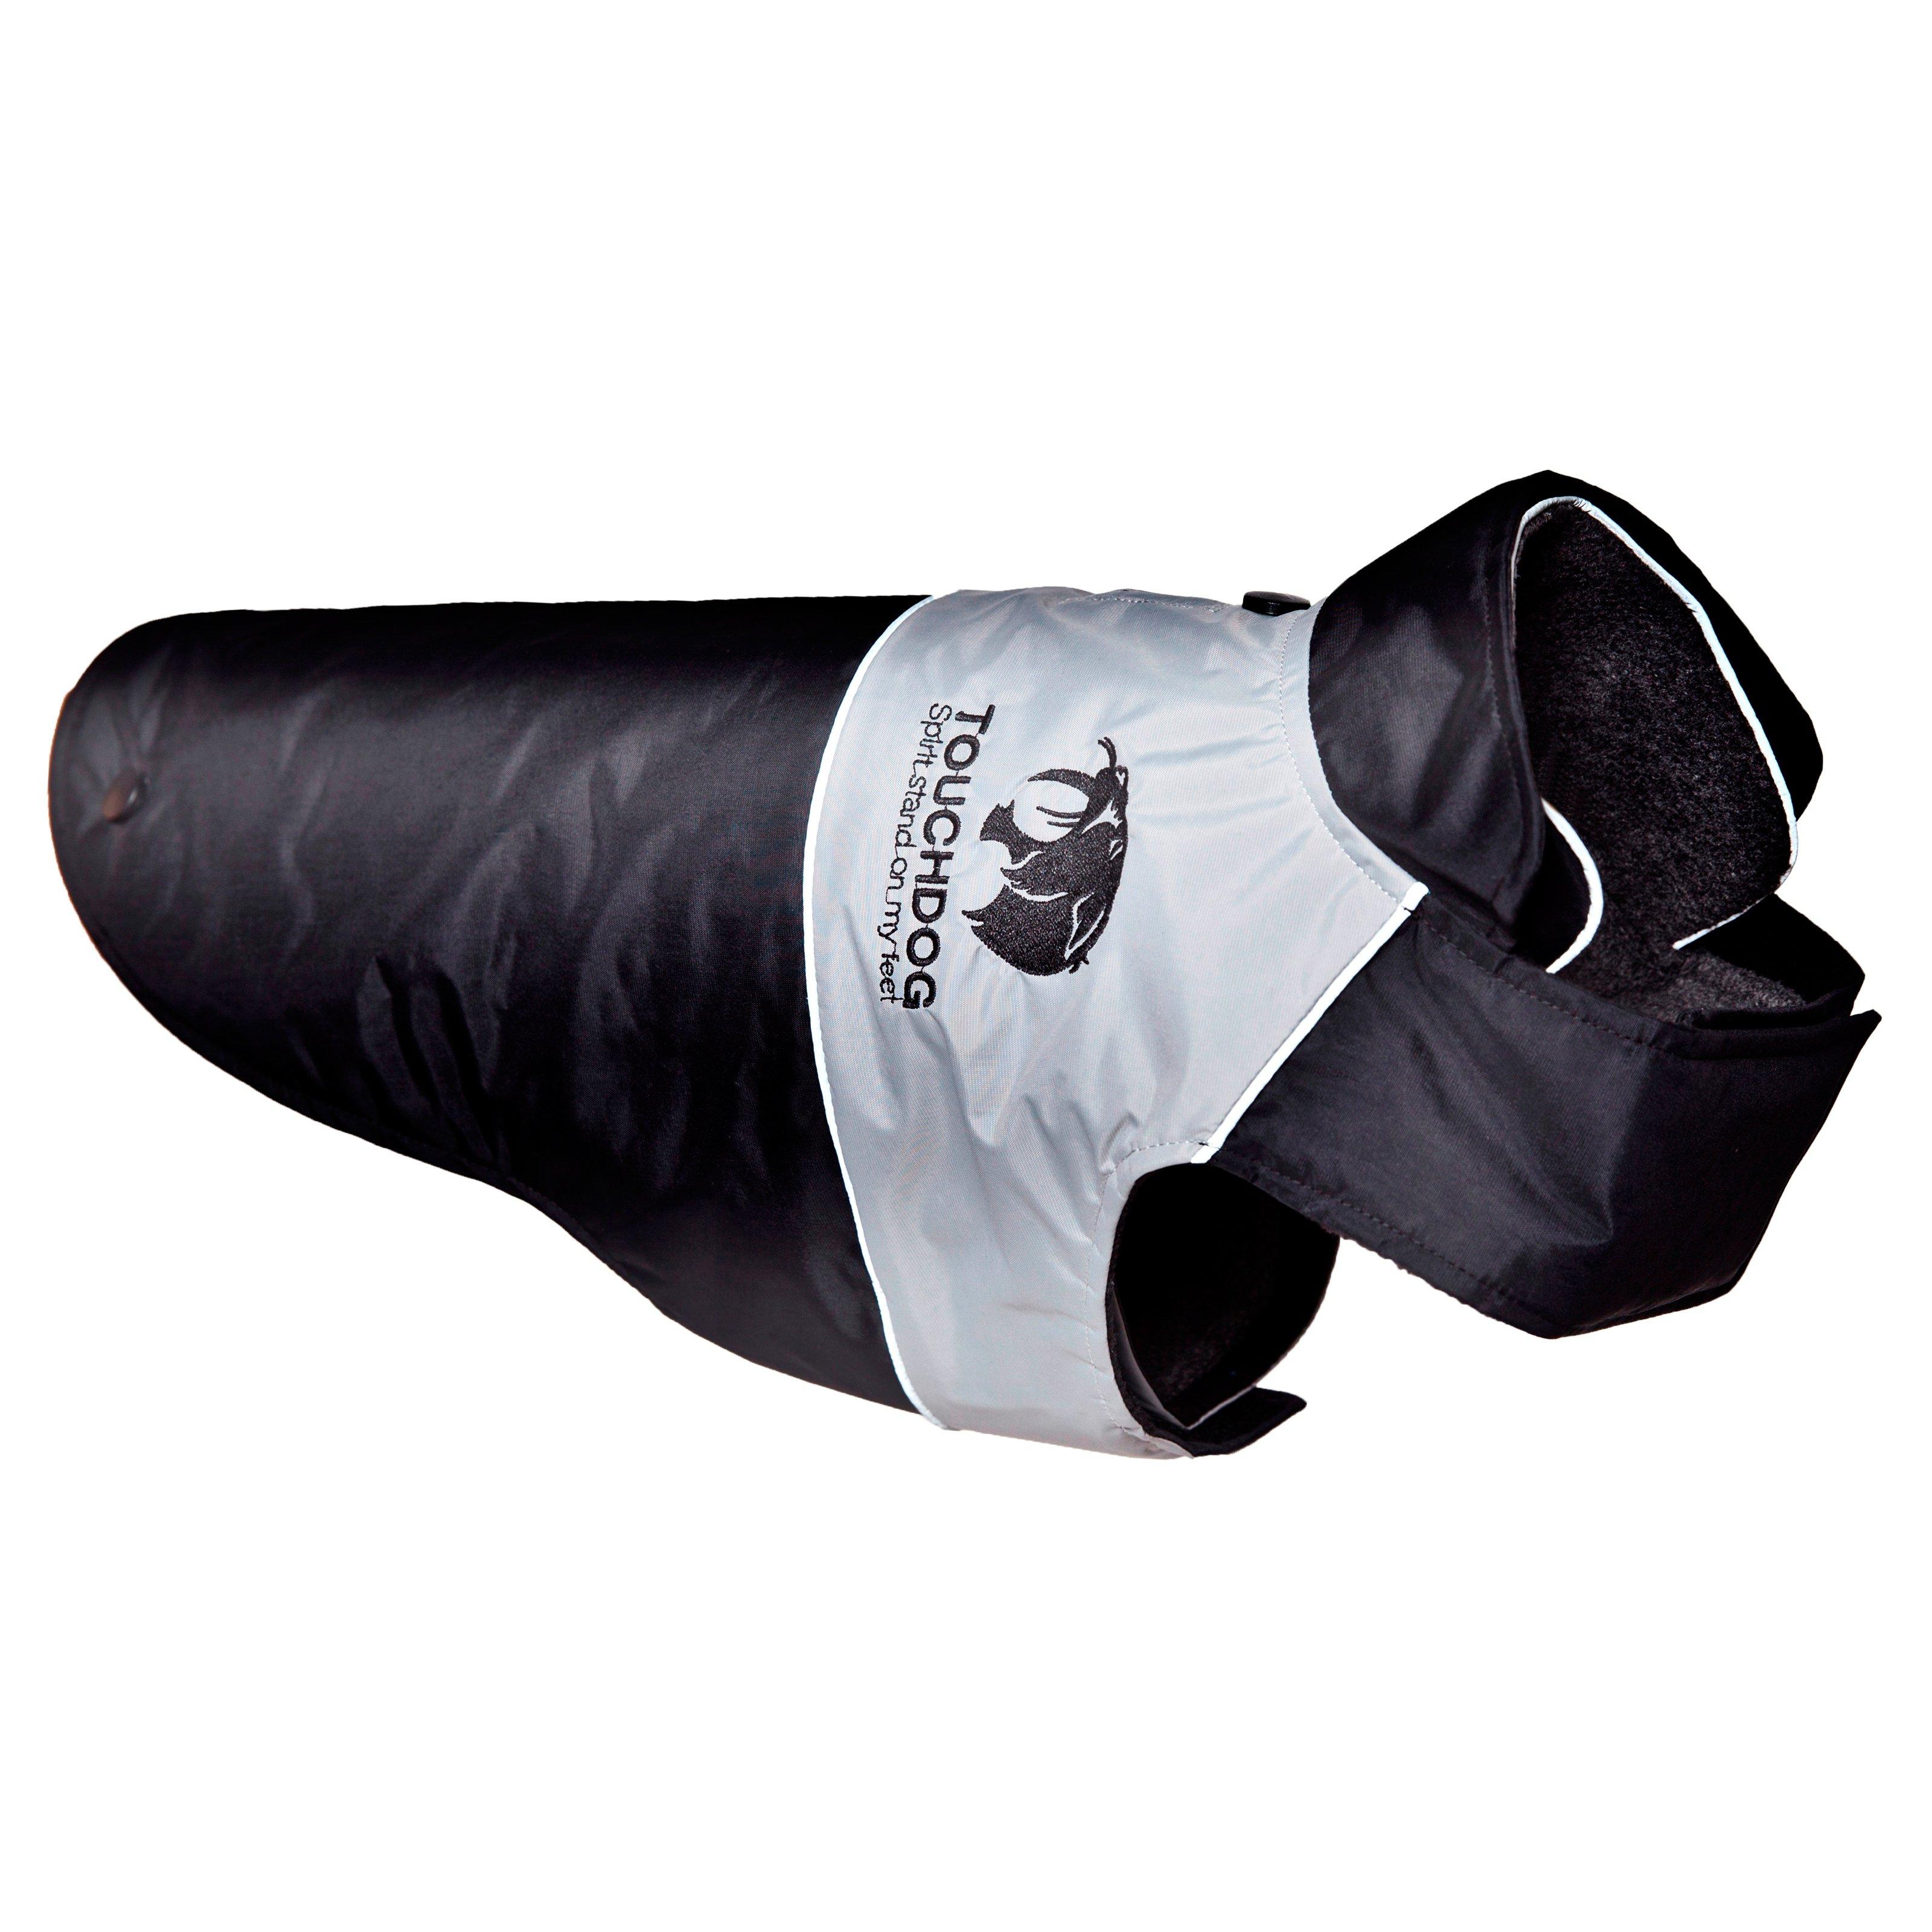 Pet Life Touchdog Lightening-Shield Waterproof 2-in-1 Convertible Dog Jacket with Blackshark Technology